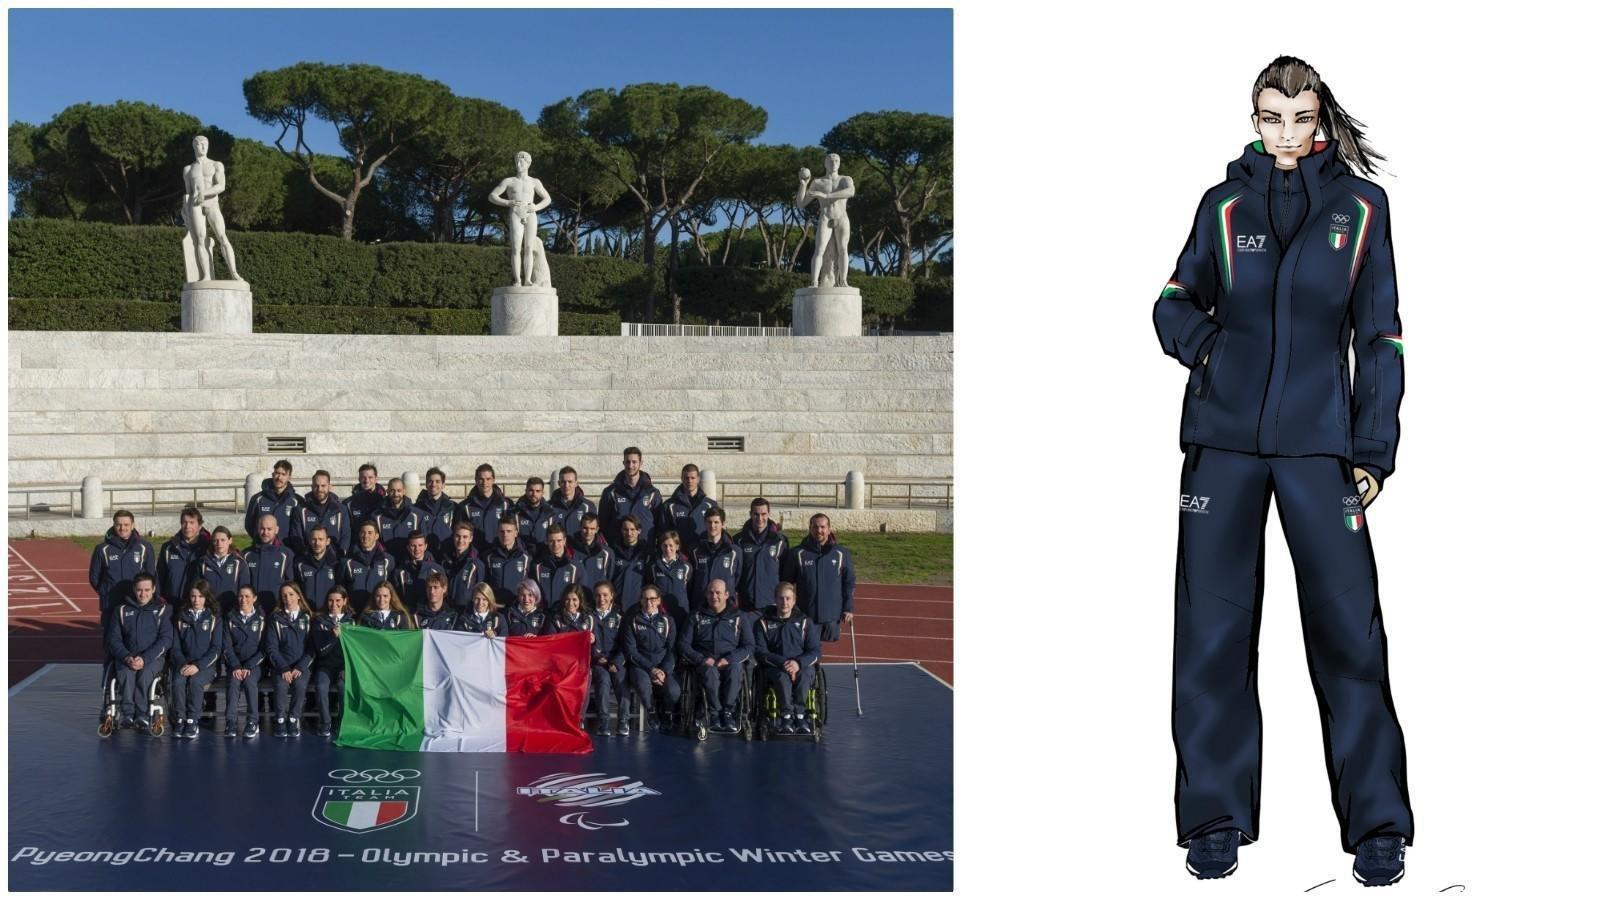 Italian athletes will wear Armani to the 2018 Olympics! - Luxurylaunches